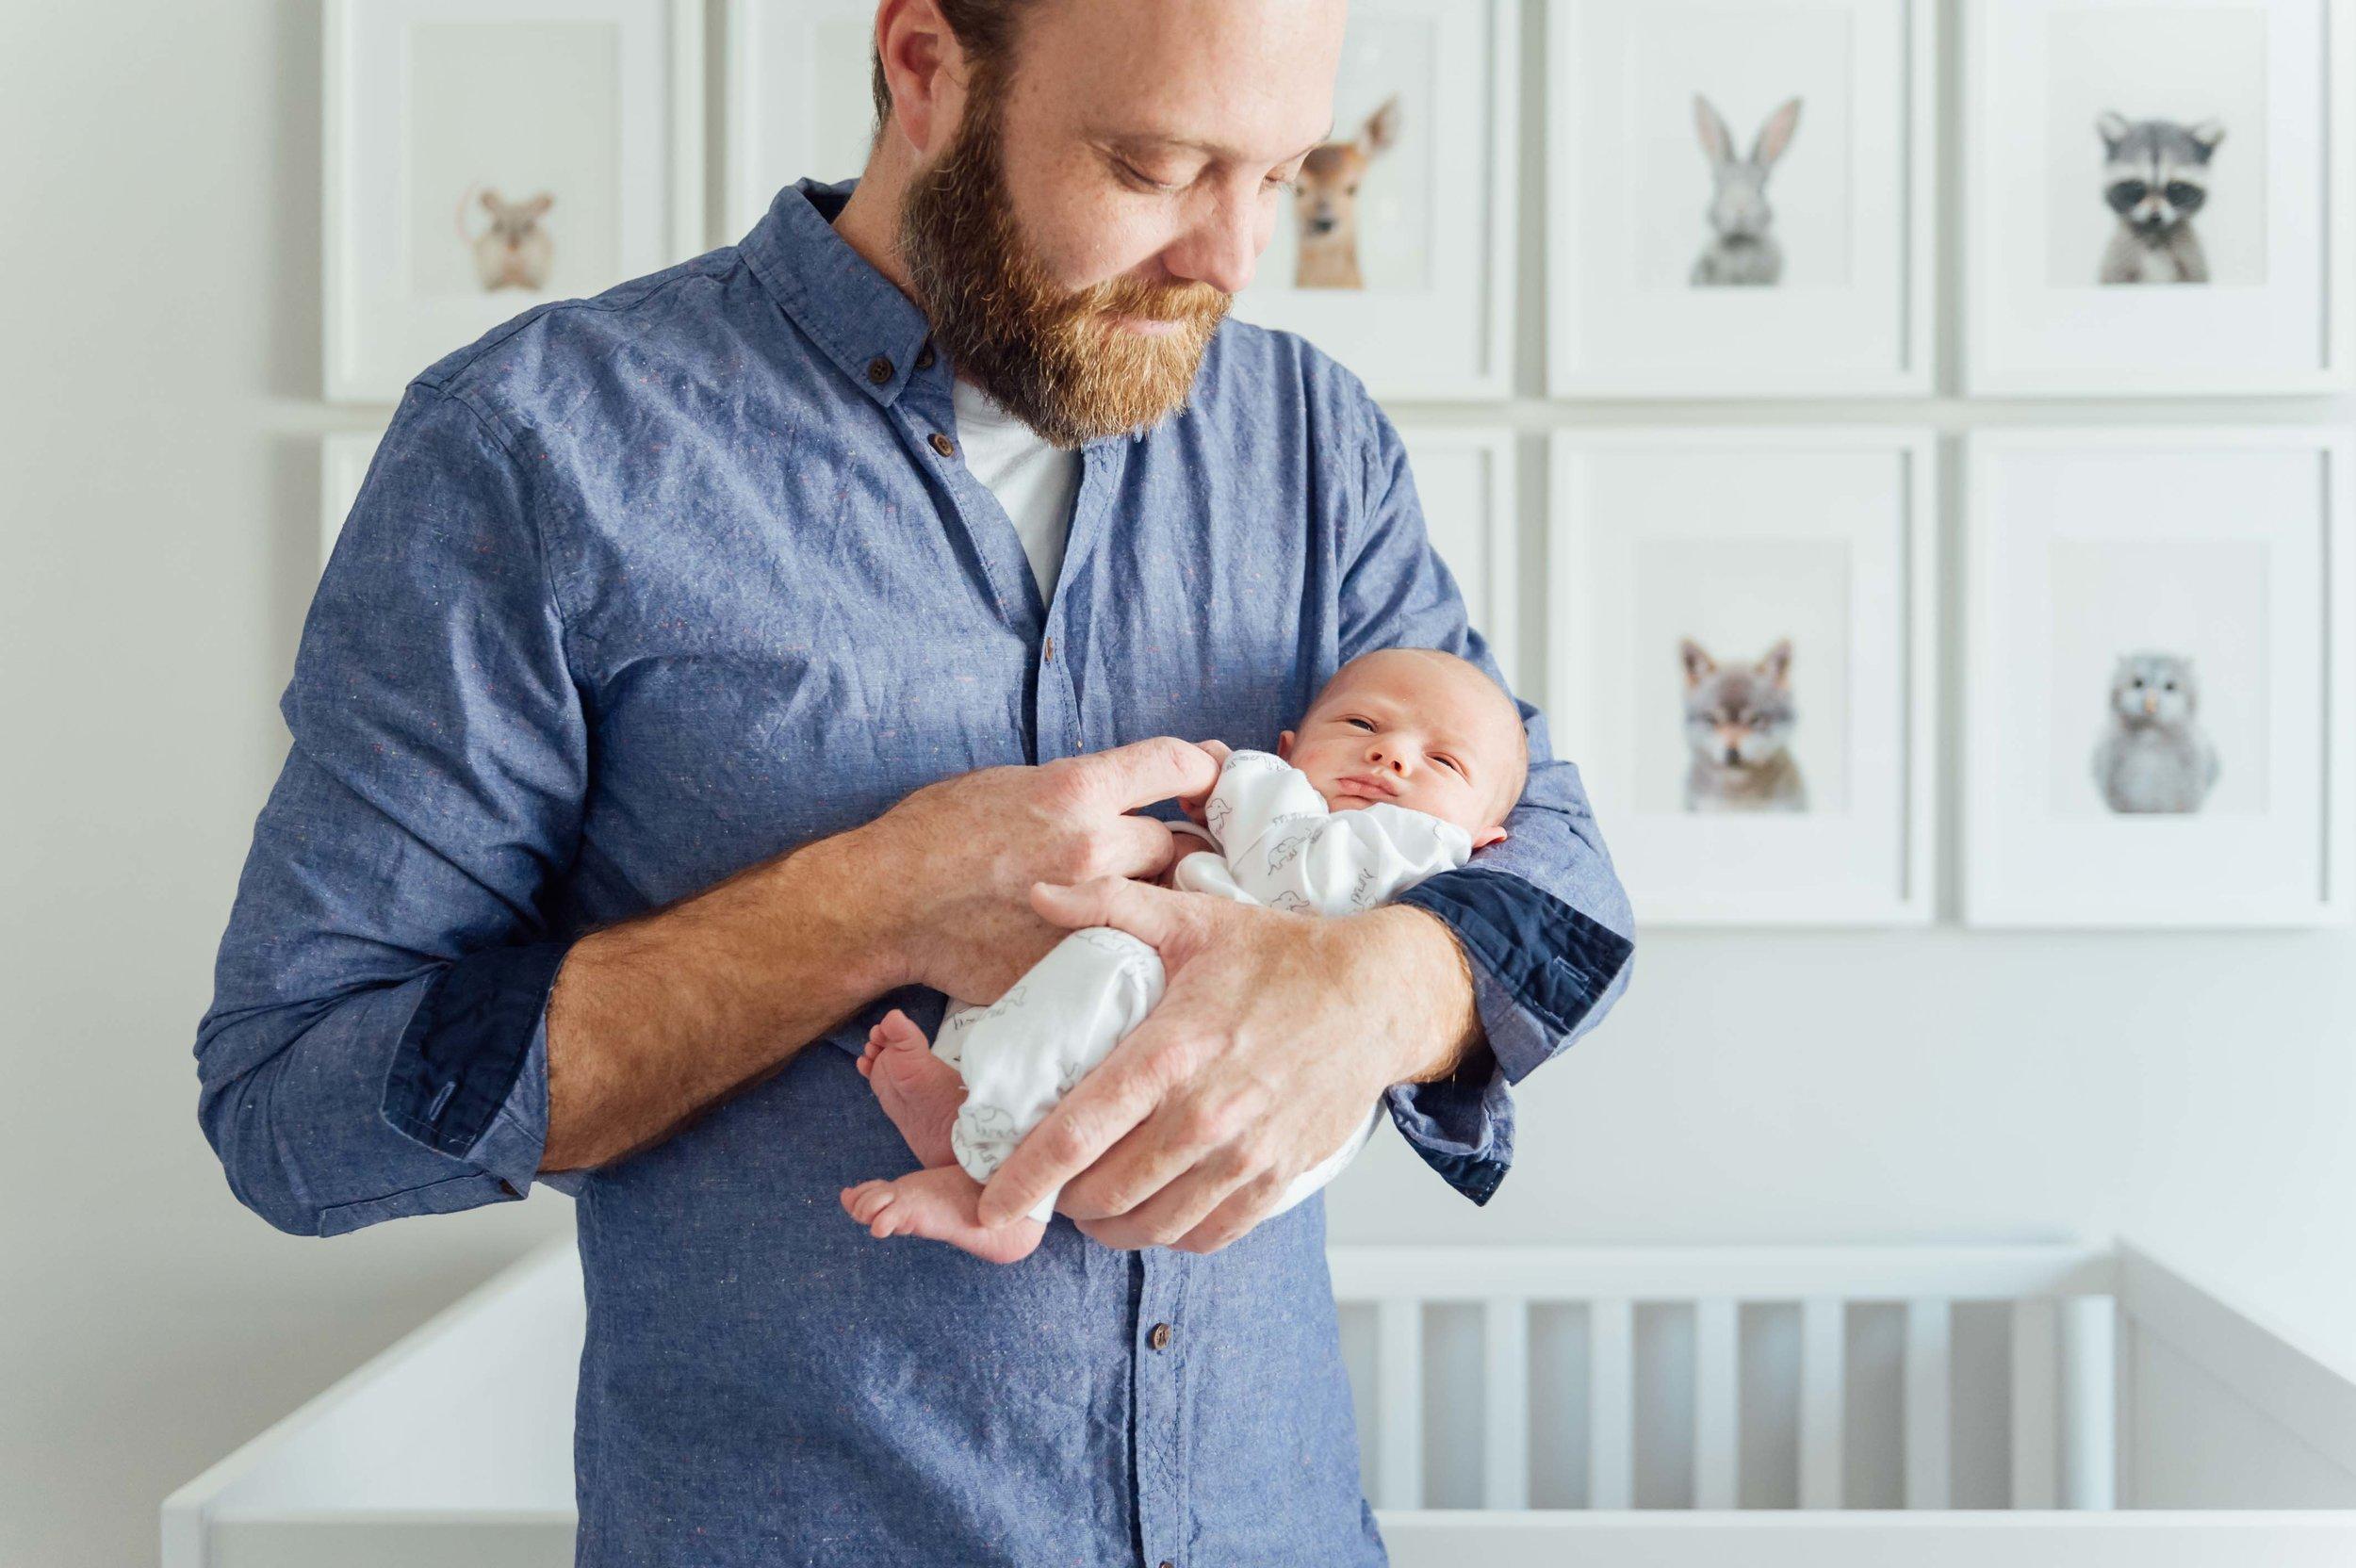 newborn in new fathers arms - niagara newborn photography